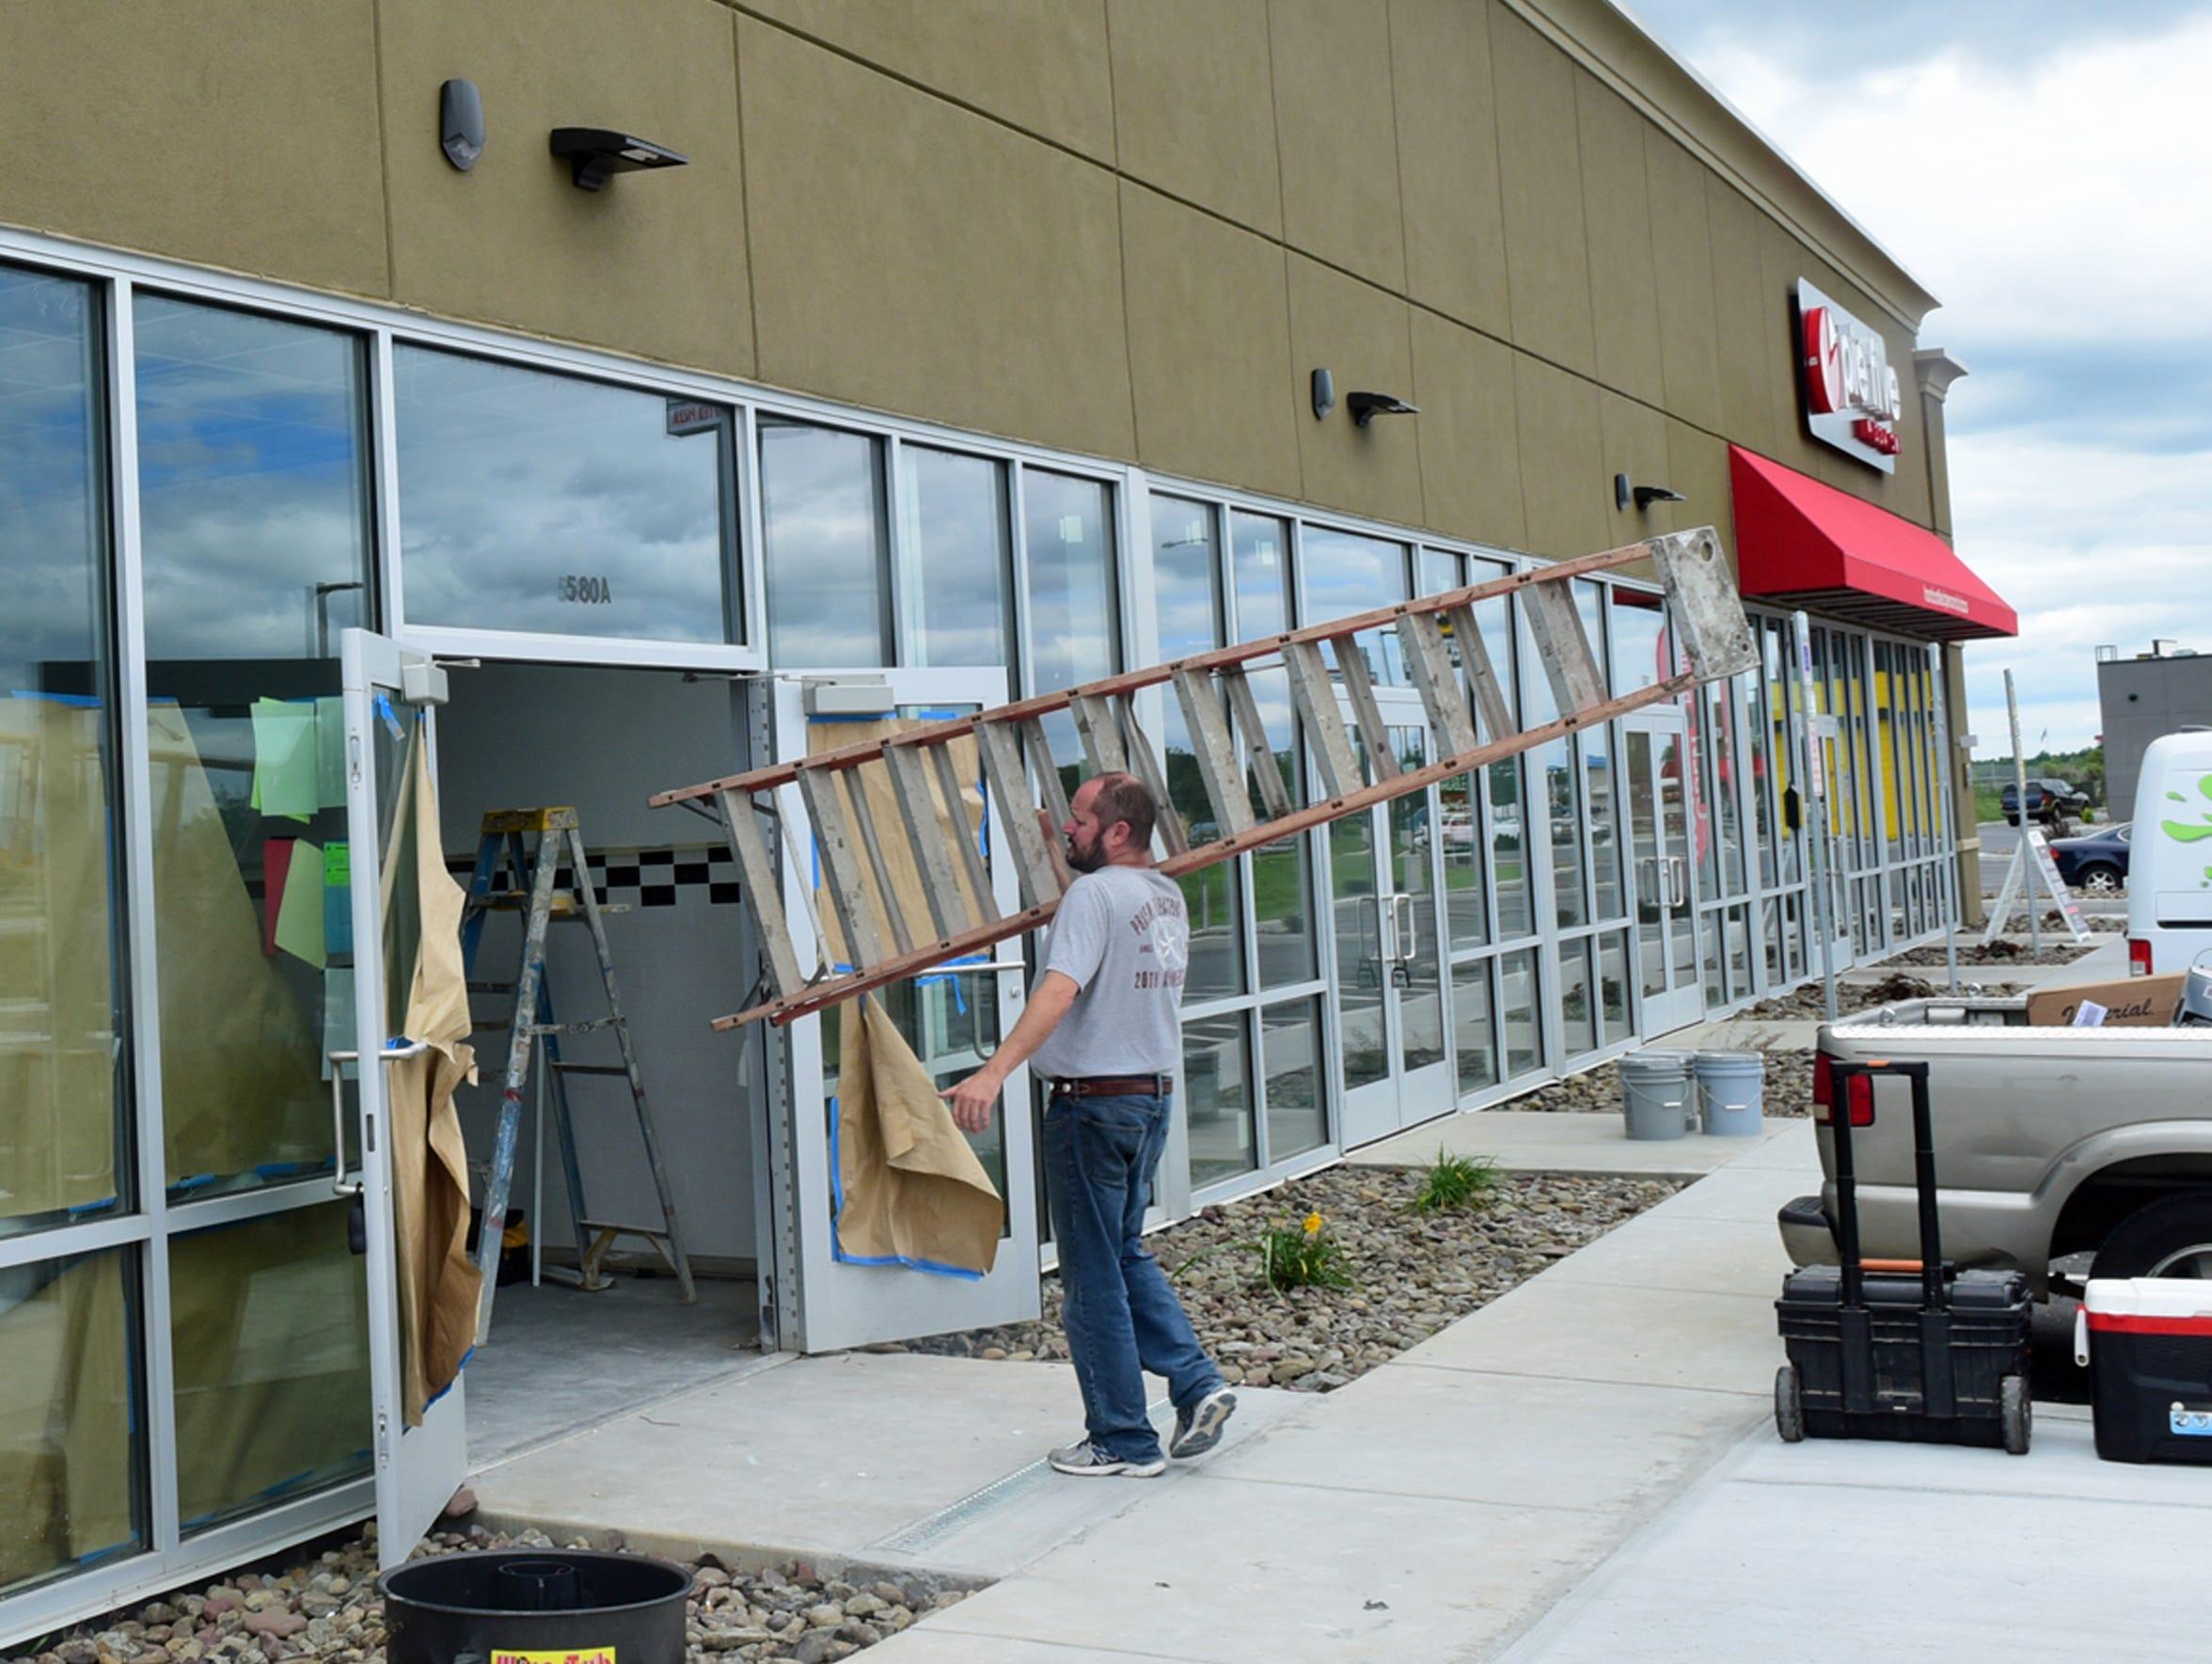 Jimmy John's Gourmet Sandwiches is under construction